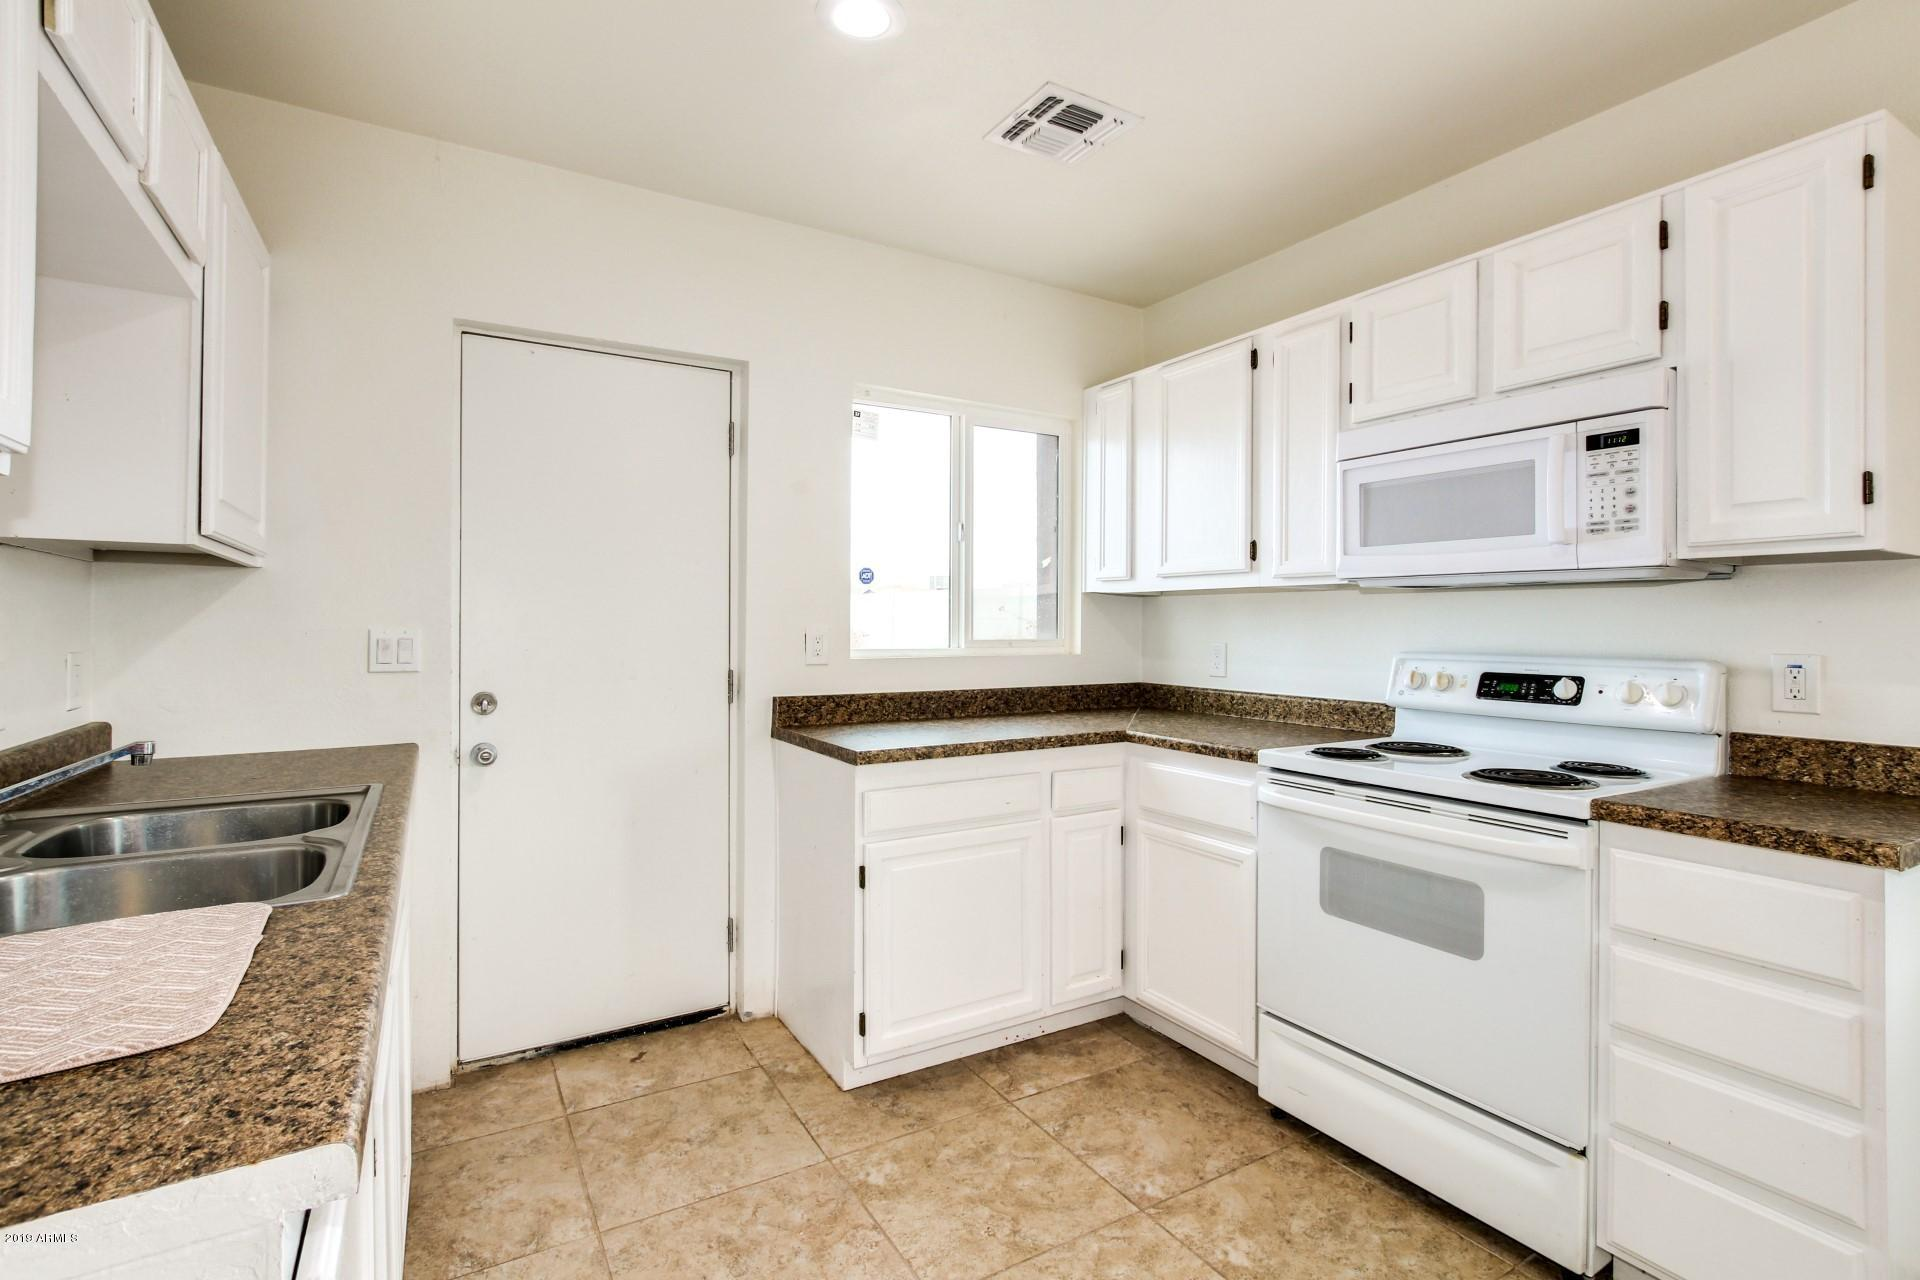 MLS 5878221 798 E DETROIT Street, Chandler, AZ 85225 Affordable